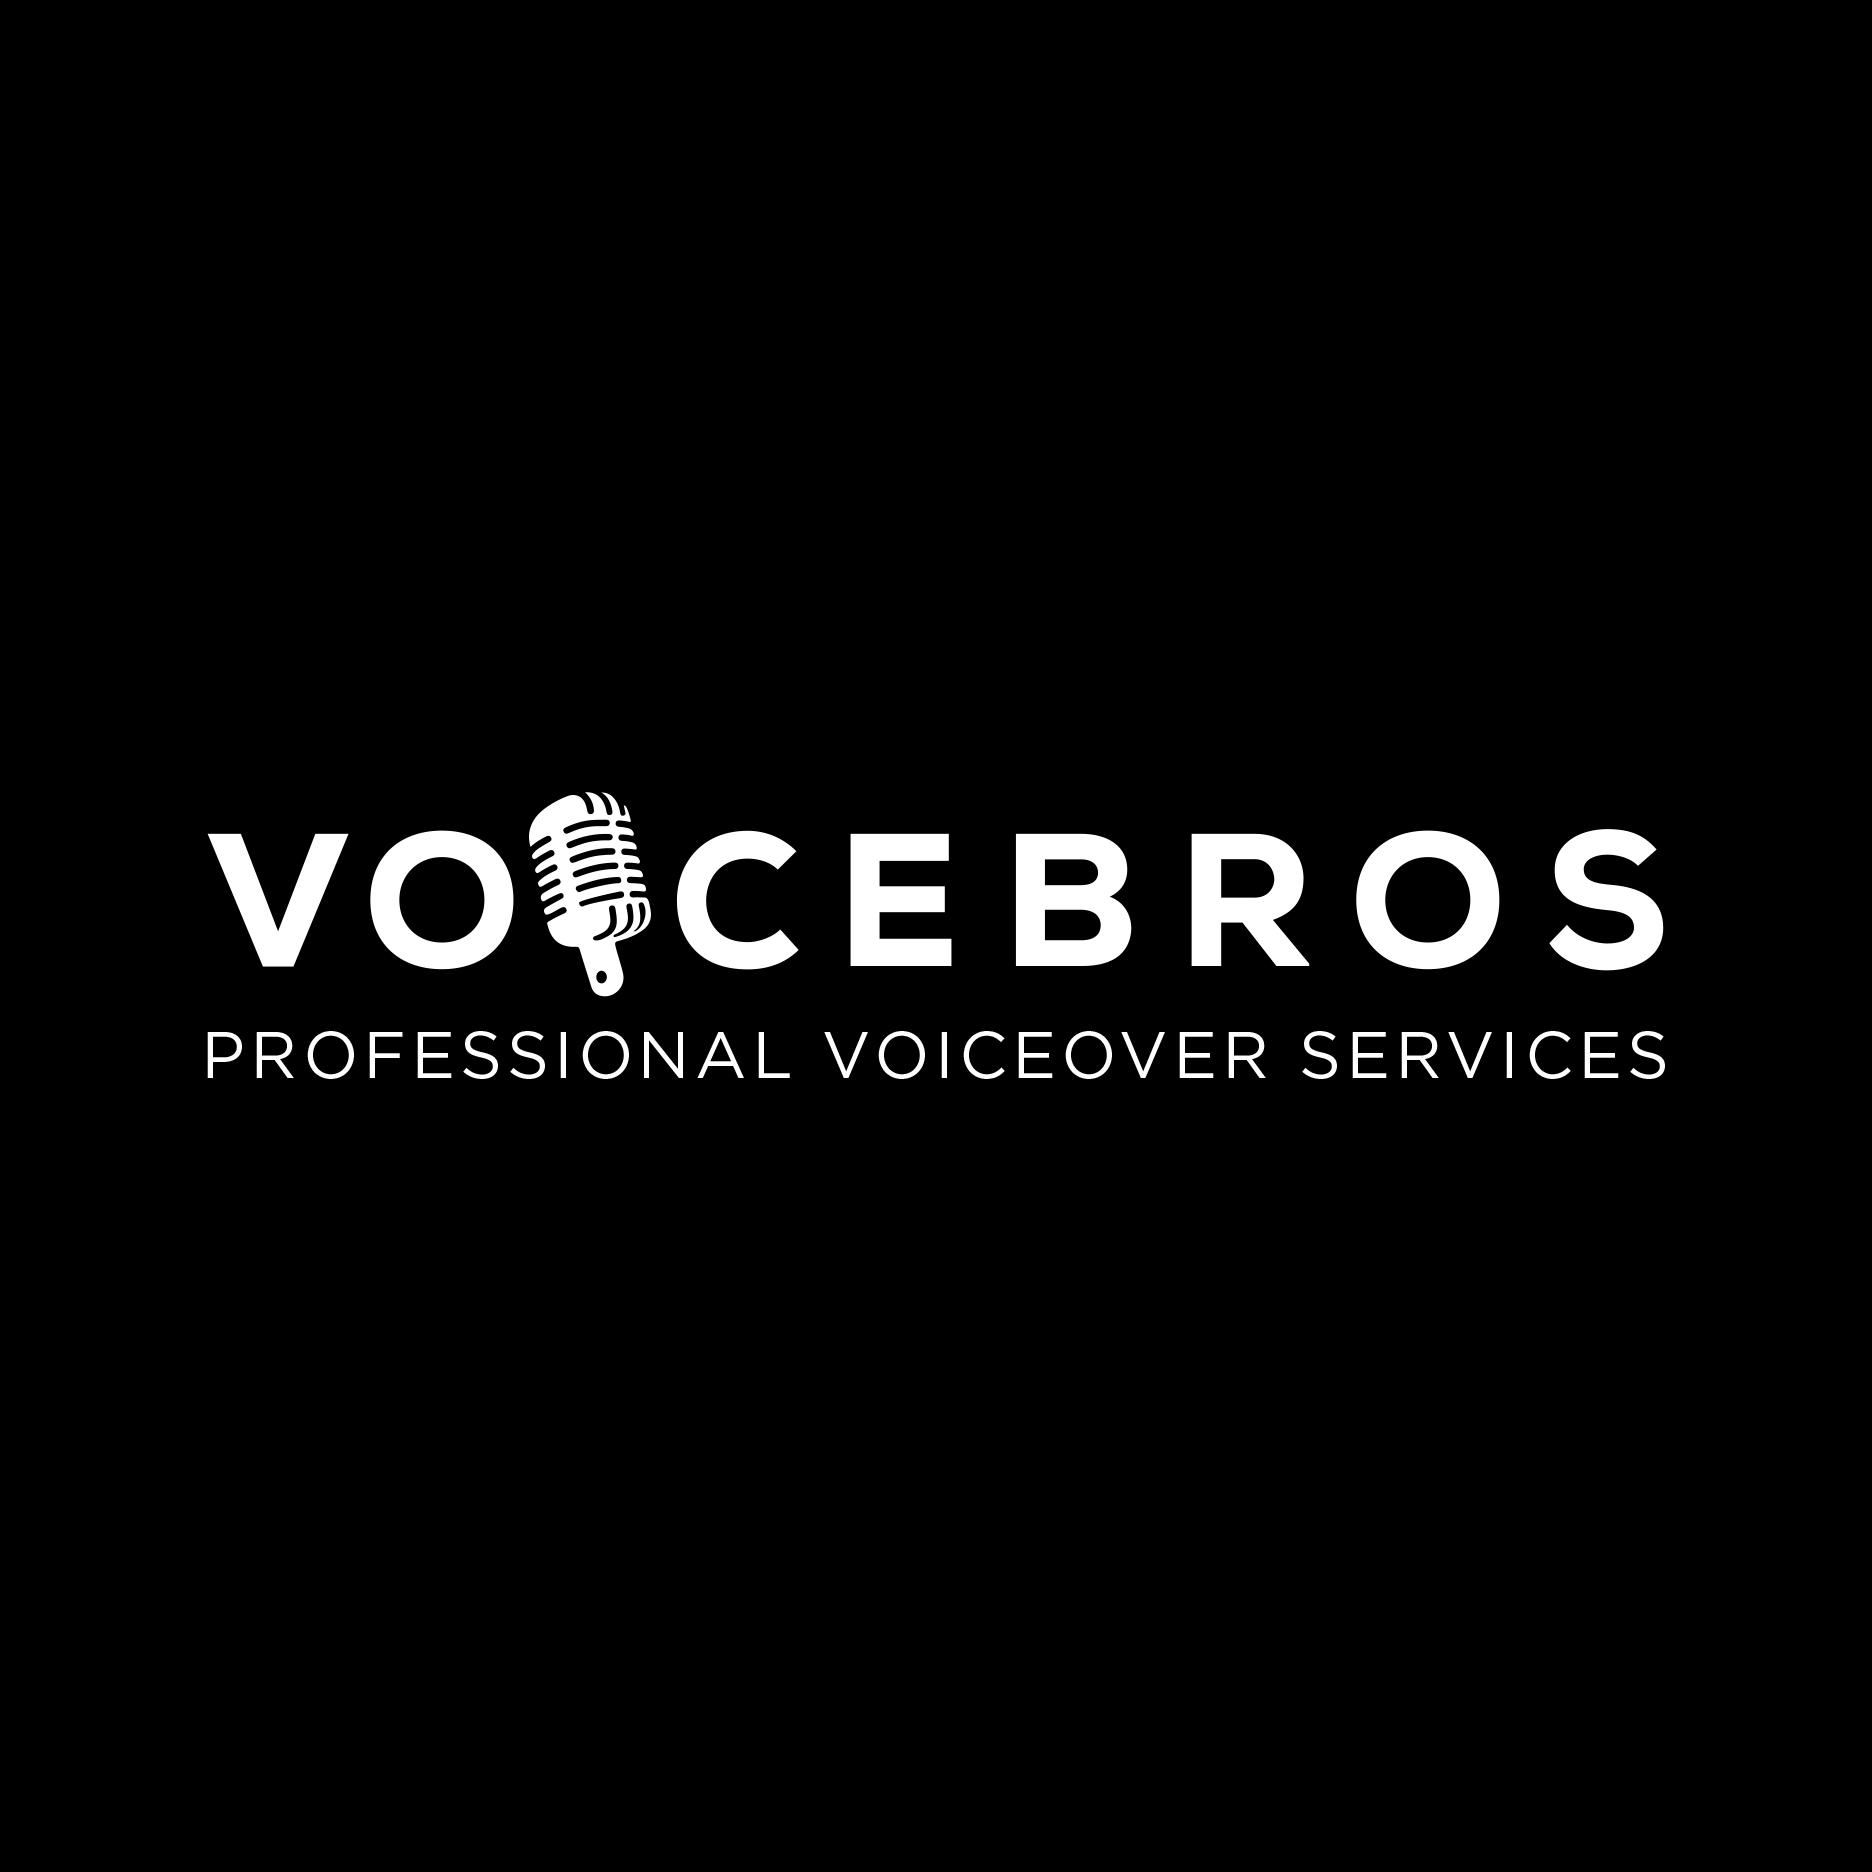 Pertti Huuskonen is a voice over actor